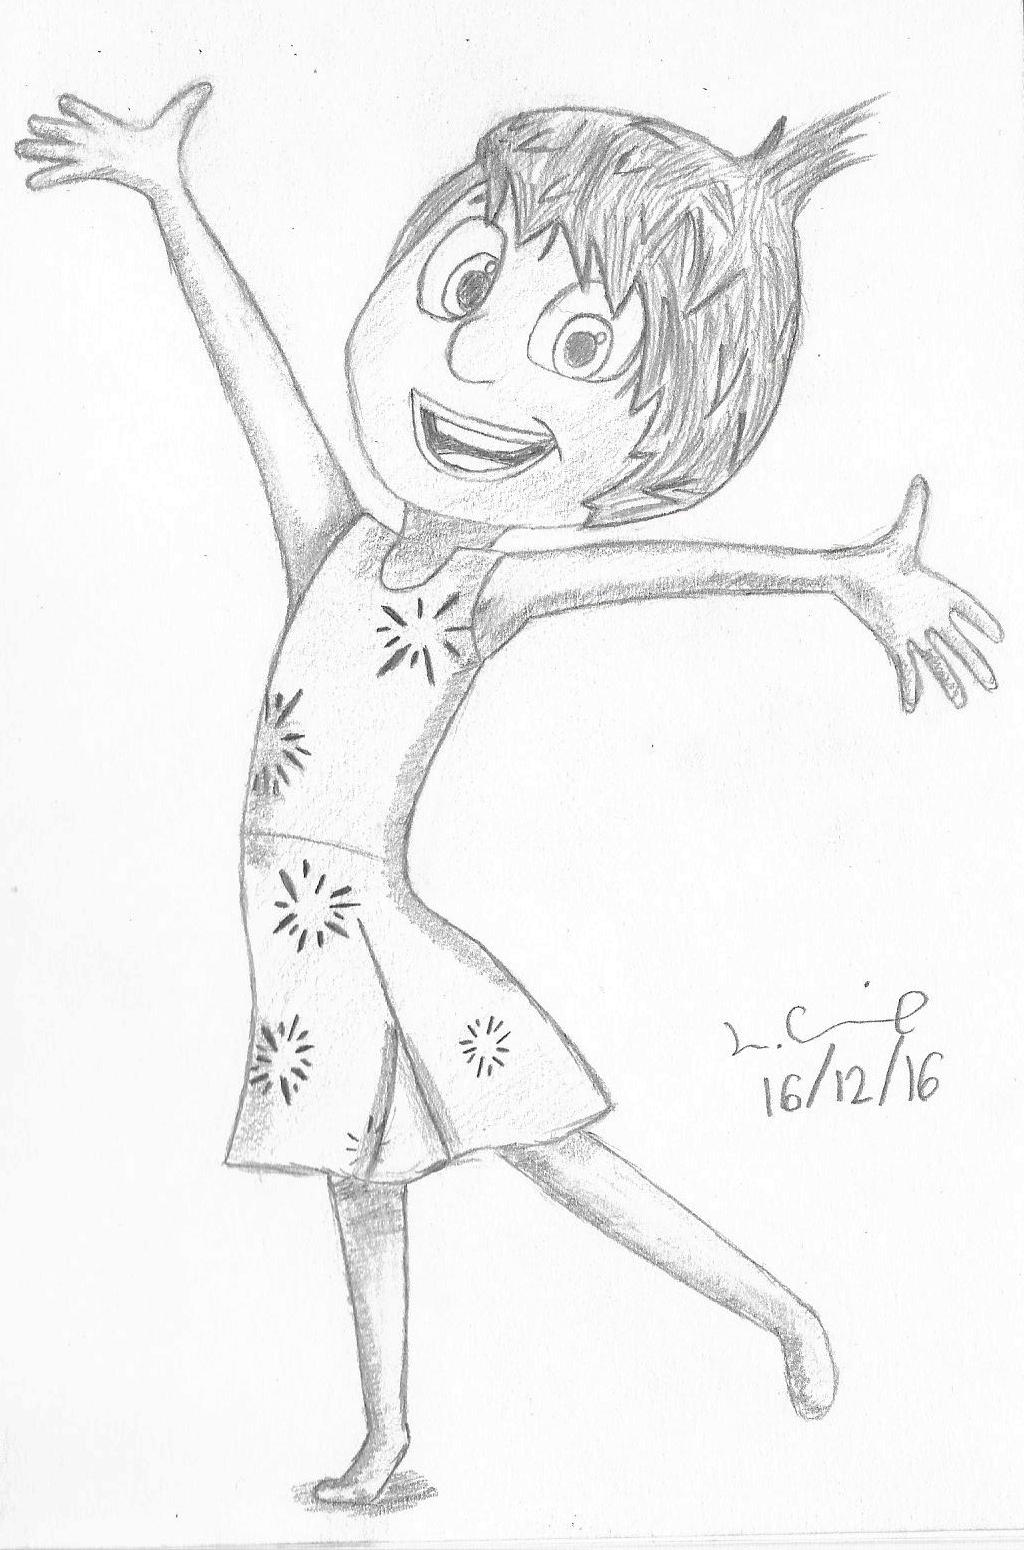 1024x1550 Inside Out Joy Sketch By Liamtheanimator